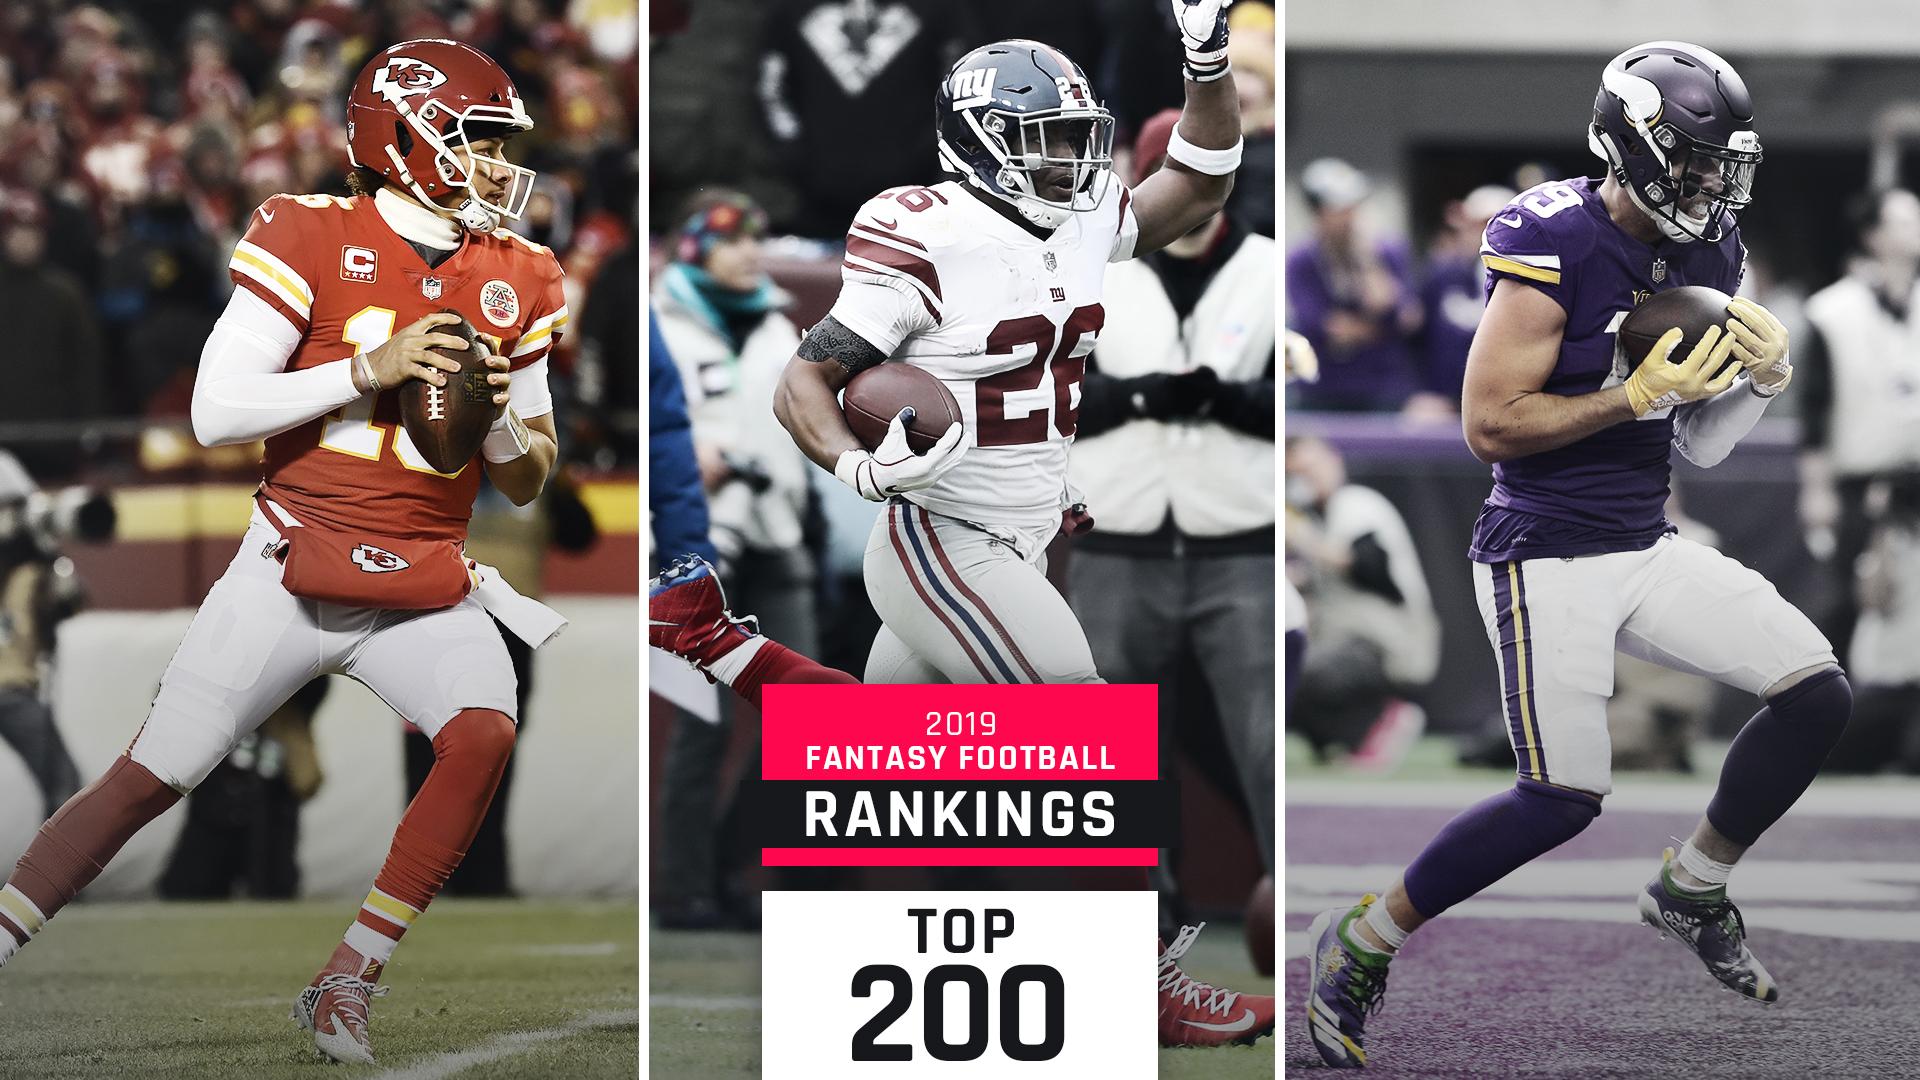 Updated 2019 Fantasy Football Rankings: Top 200 Cheat Sheet